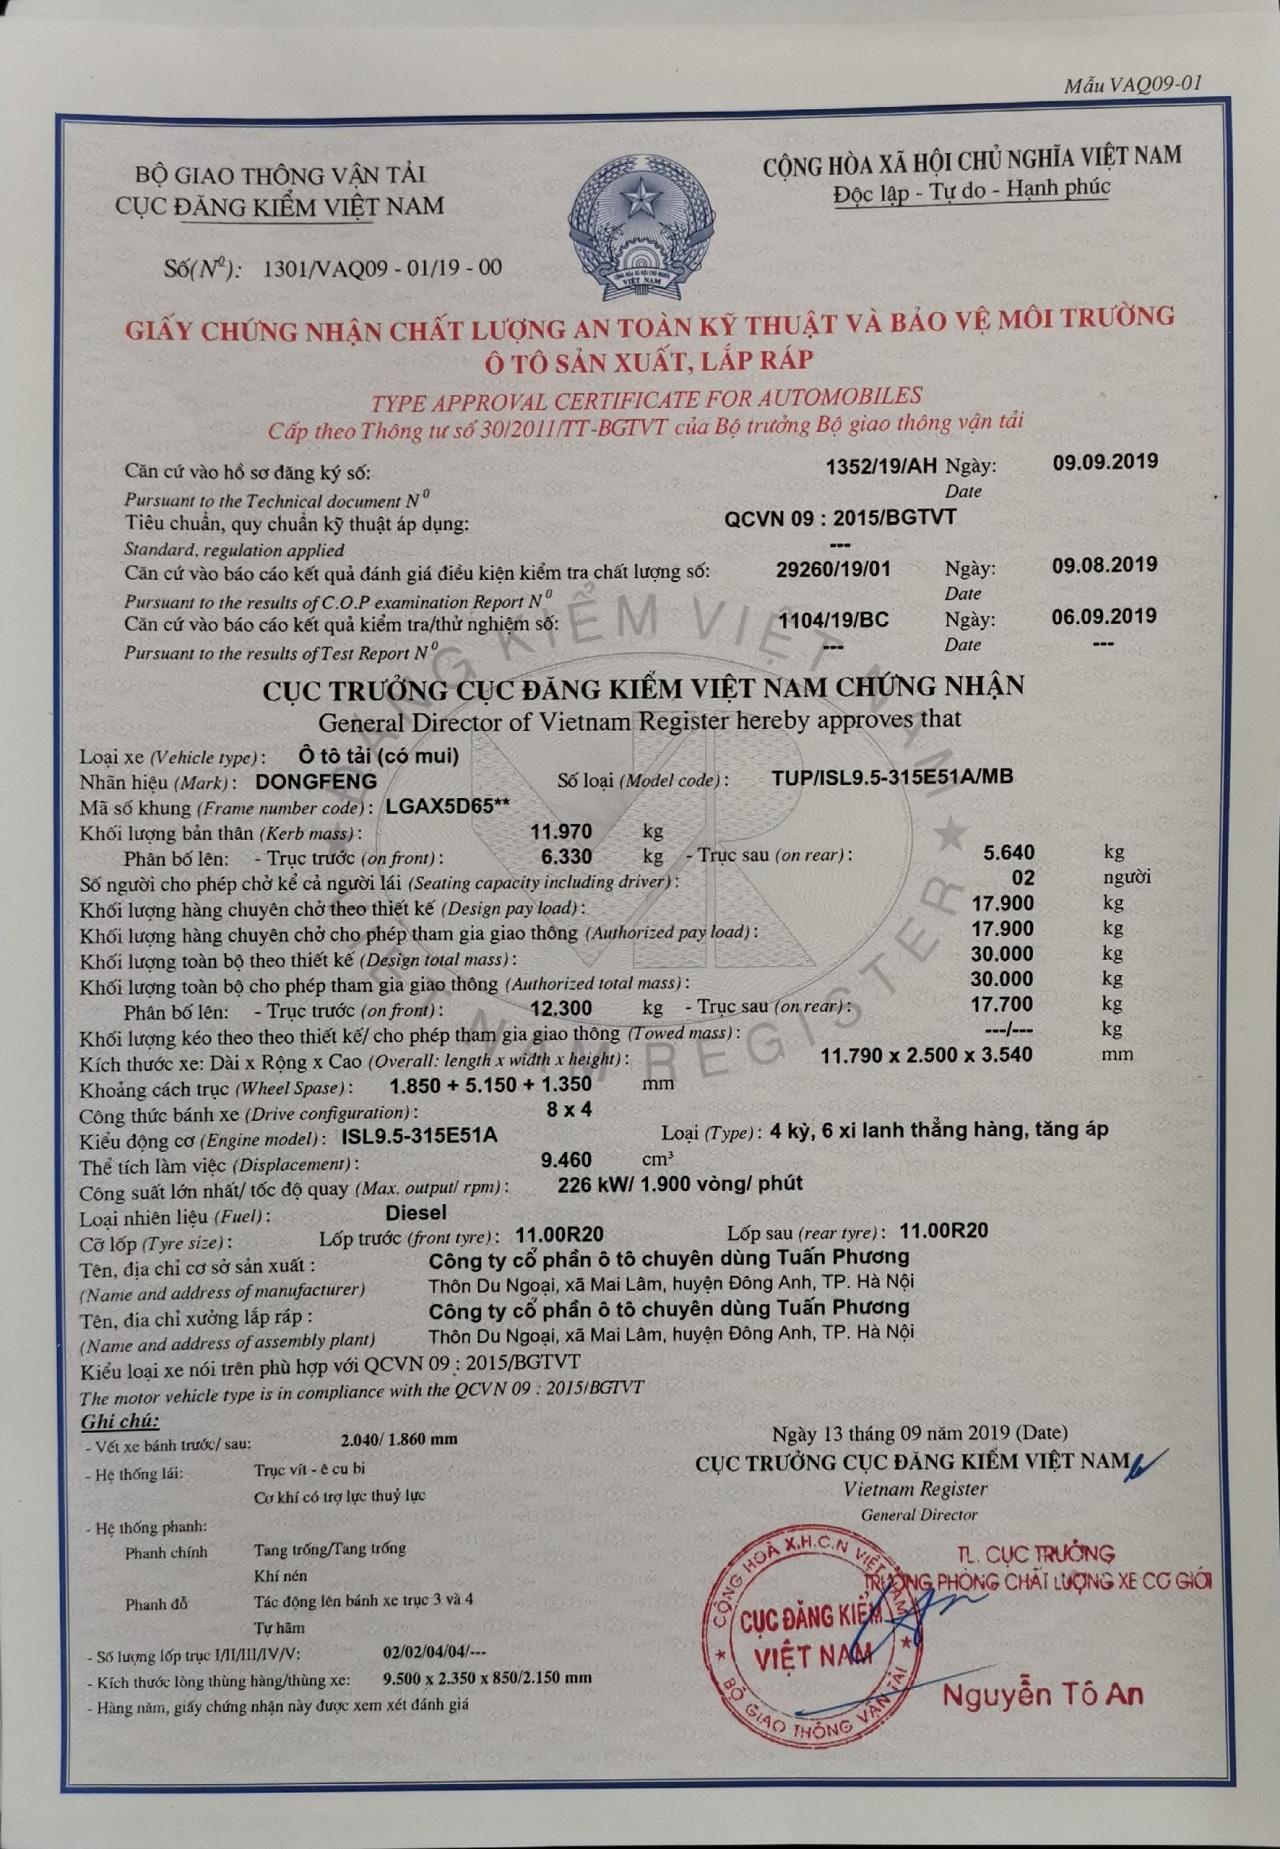 XE TAI DONGFENG 4 CHÂN L315